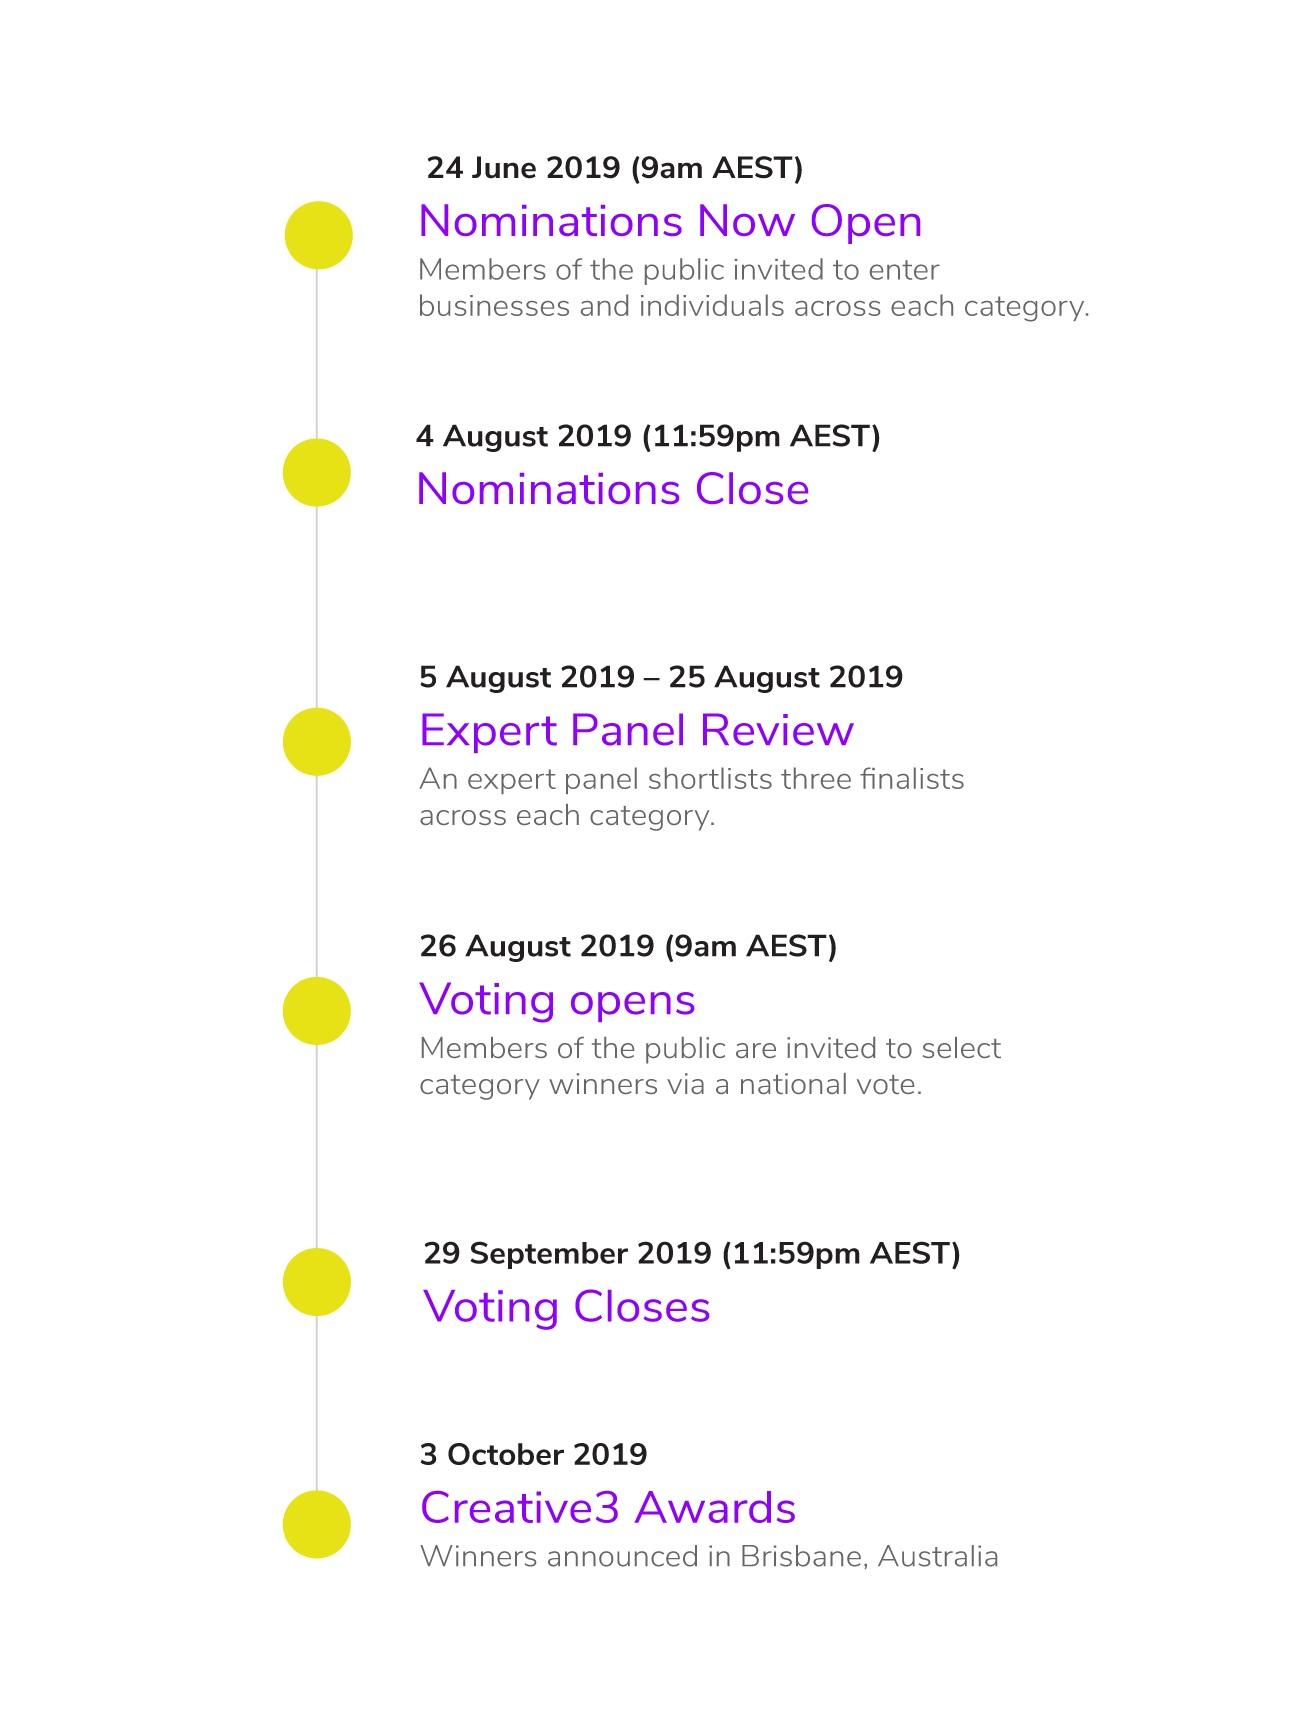 C3+-+Key+Dates+Timeline_update-01.jpg